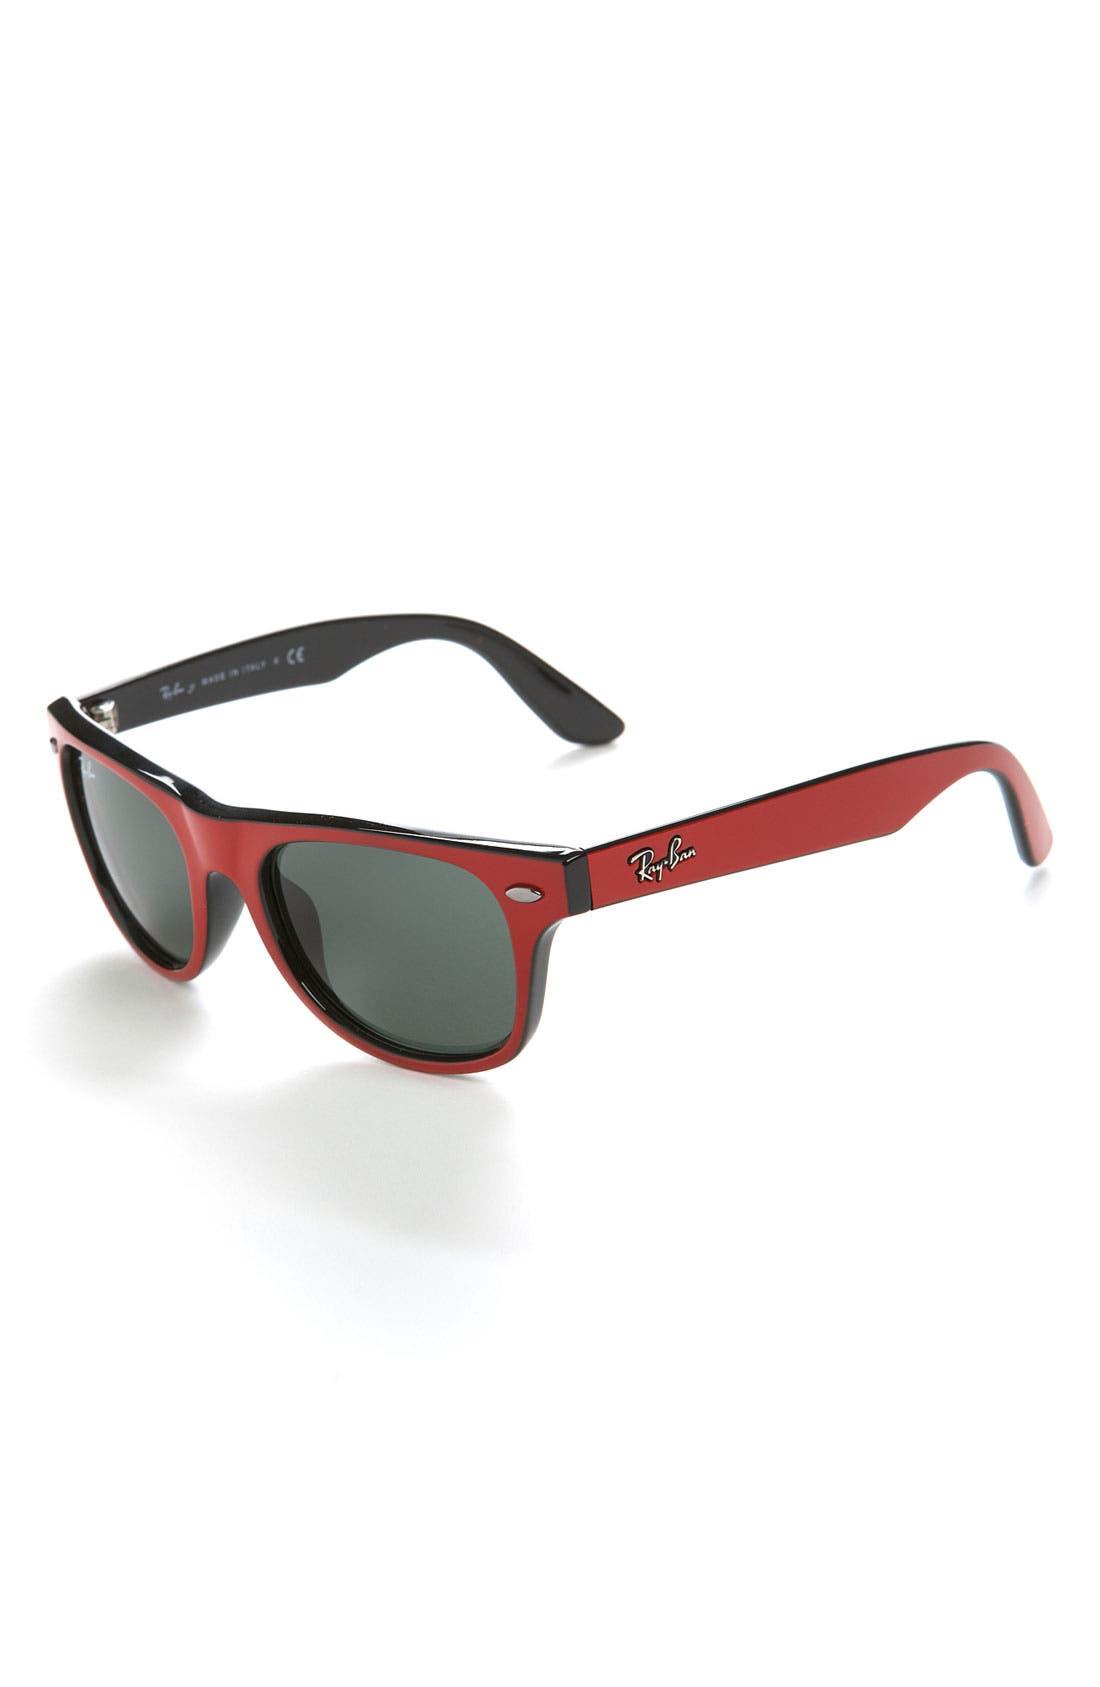 Main Image - Ray-Ban Wayfarer 44mm Sunglasses (Boys)